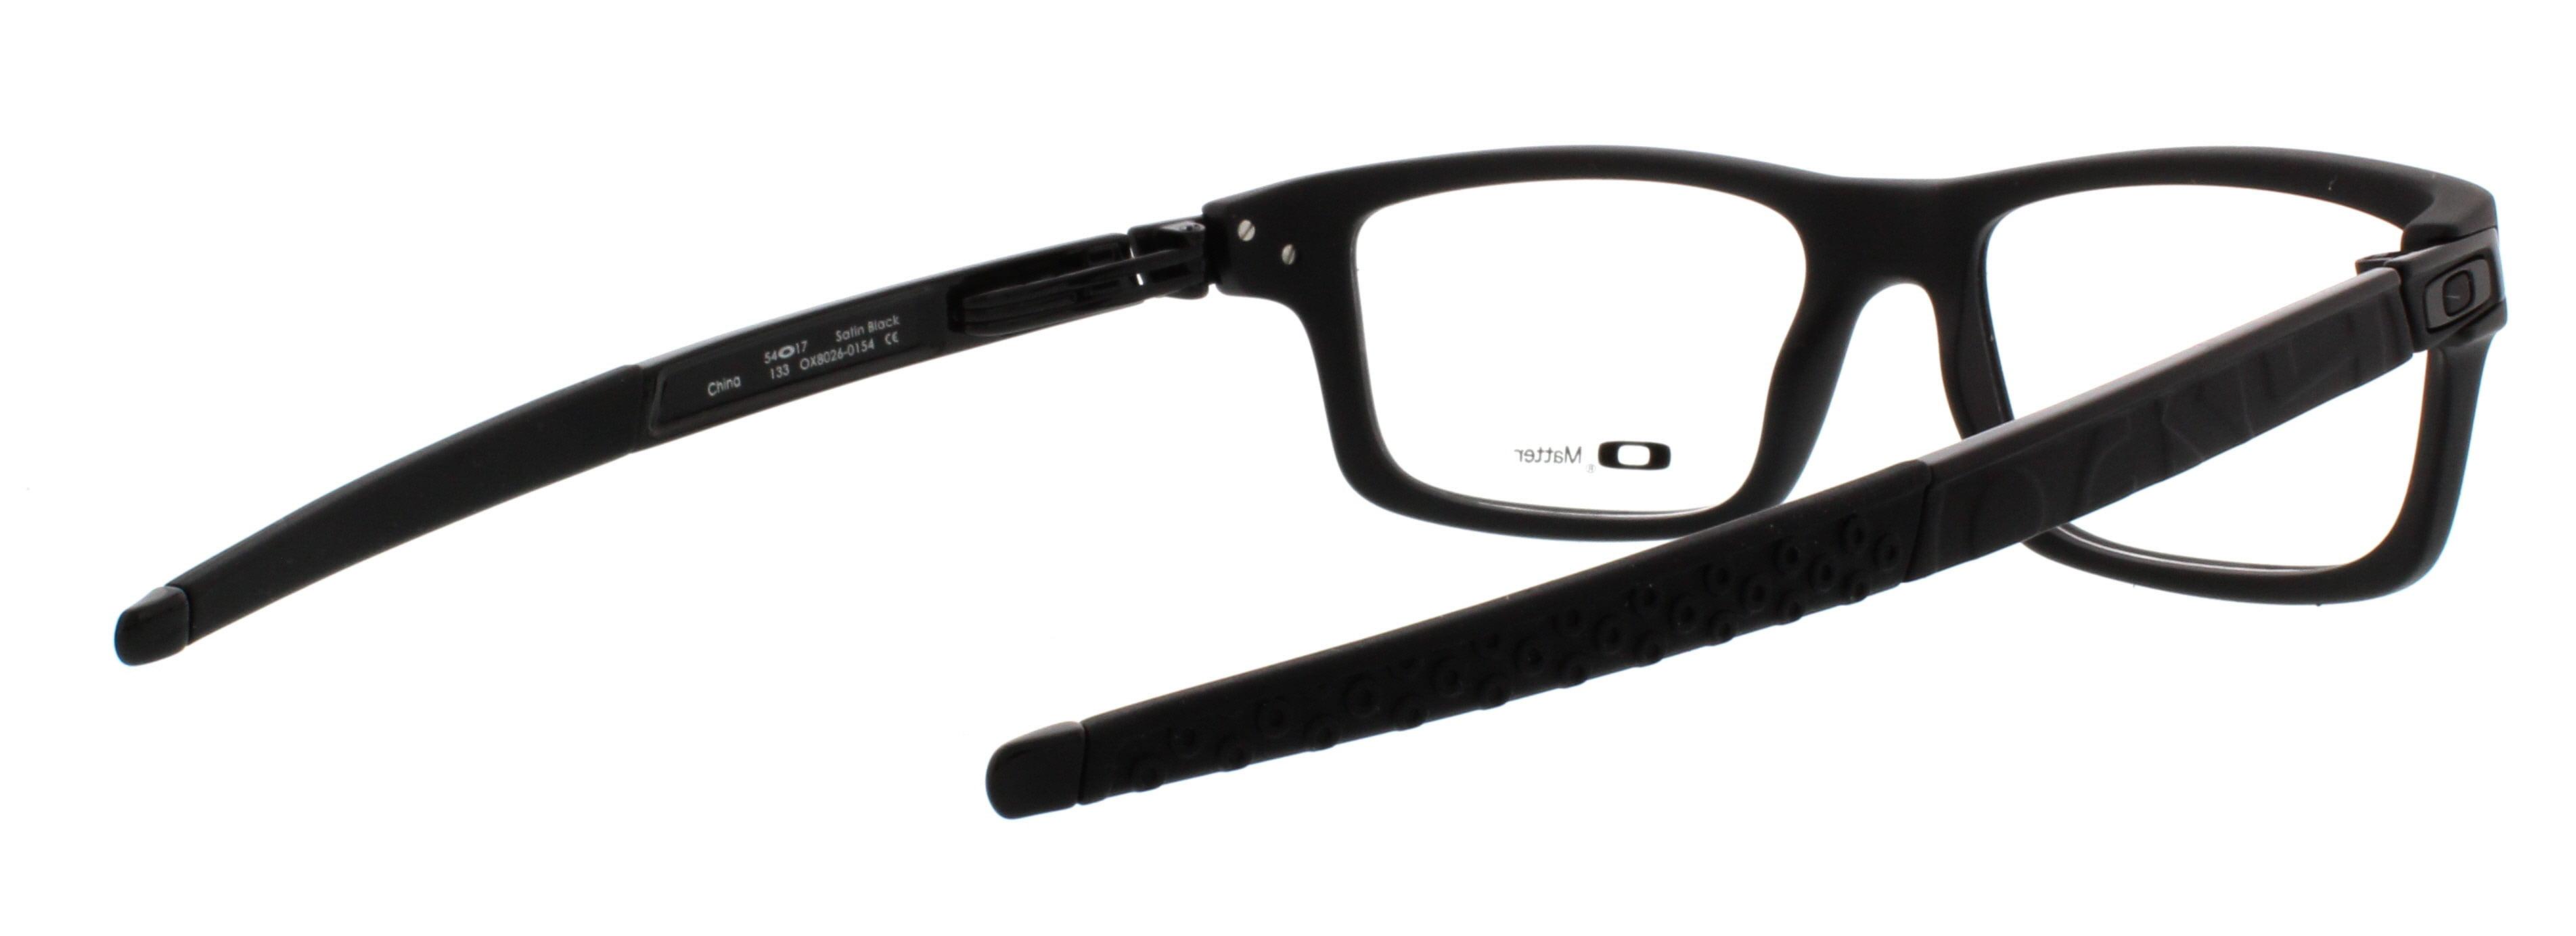 a3ebd7b134 Oakley Currency OX8026 01 54mm Unisex Rectangular Eyeglasses - Walmart.com